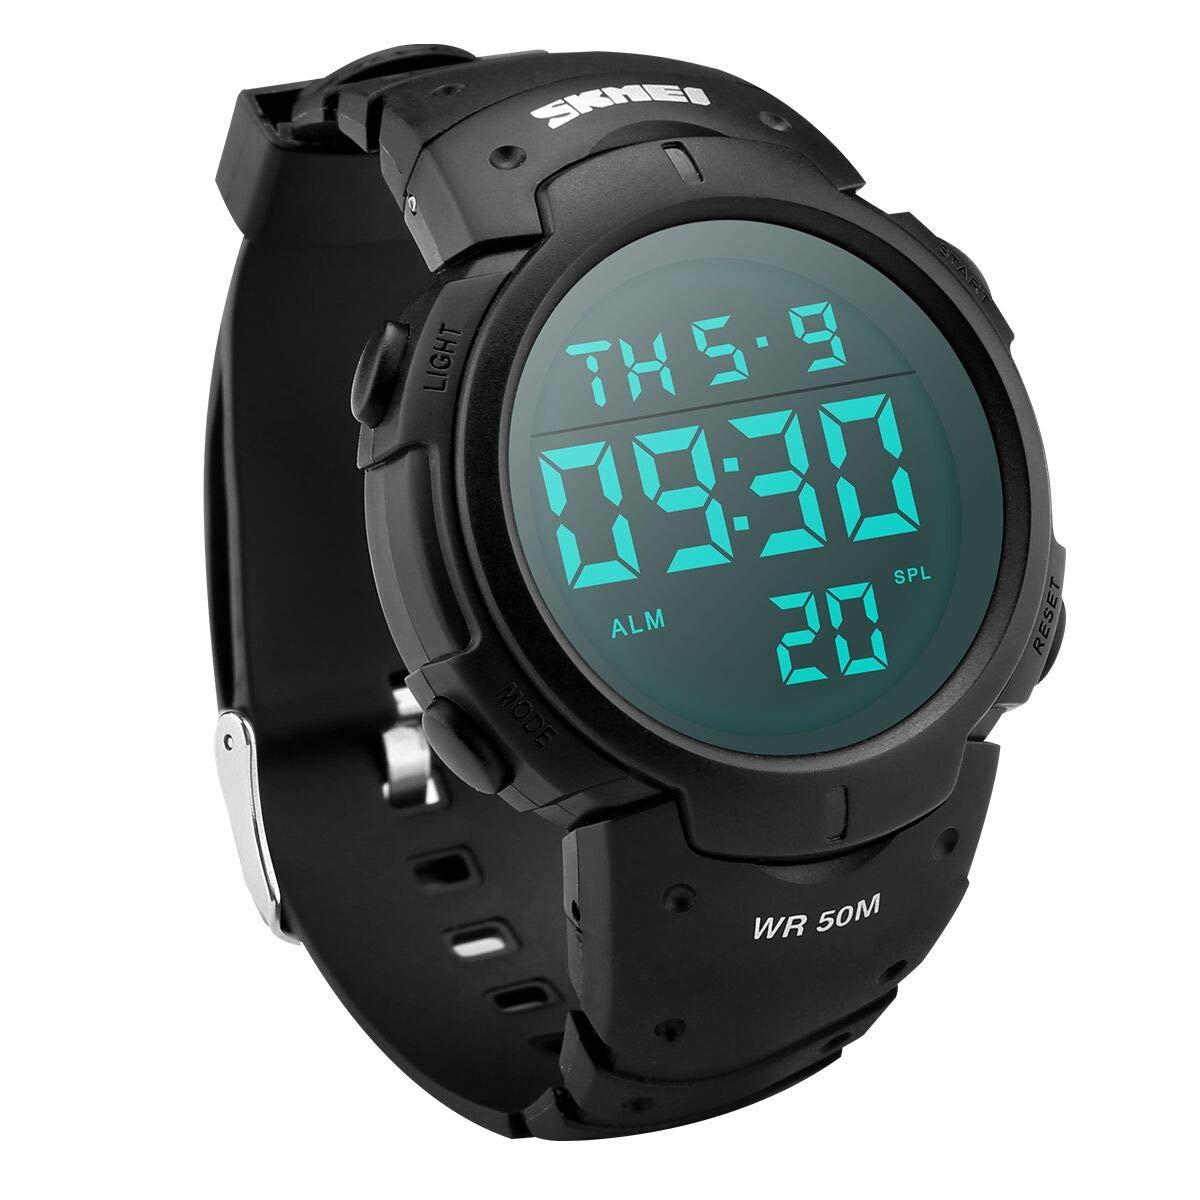 Digital Sports Watch, LED Screen Waterproof Watch with Alarm, Stopwatch,Date, Luminous Night Light,Outdoor Military Watches Multifunction Electronic Wrist Watch for Men Women Kids